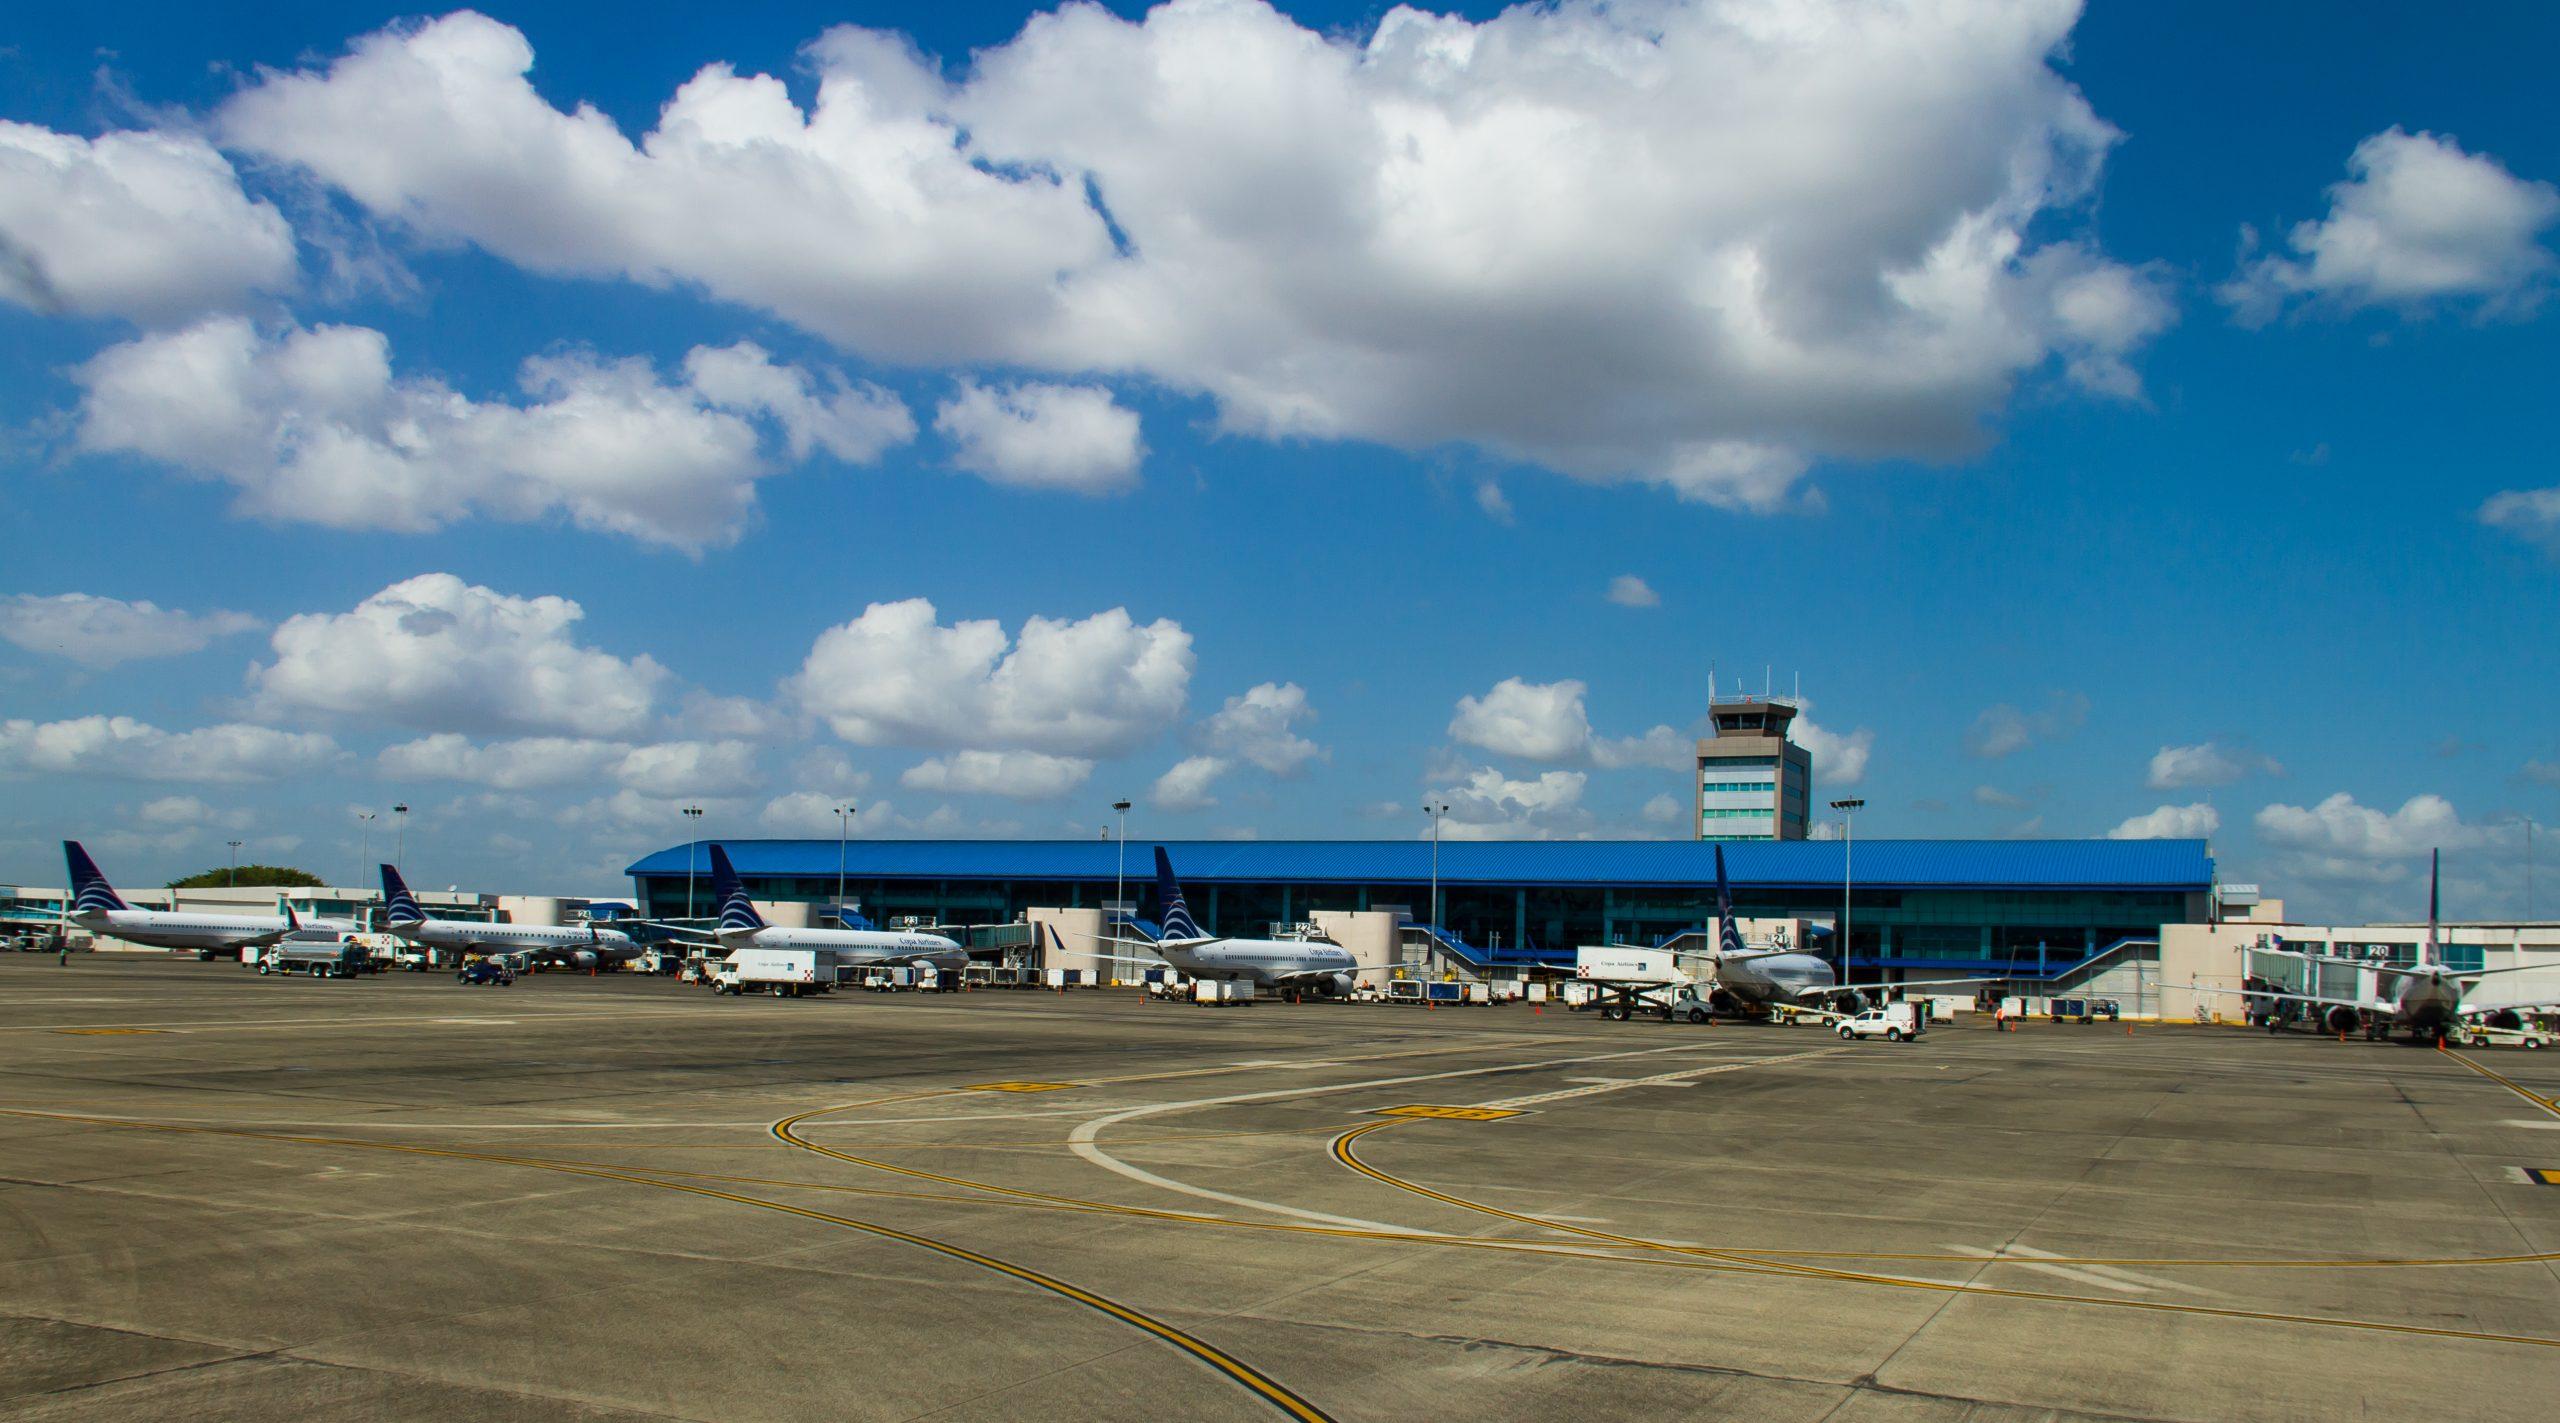 Tocumen_Intl_Airport_(Panama_City)_Hub_of_Copa_Airlines_(8418904002)